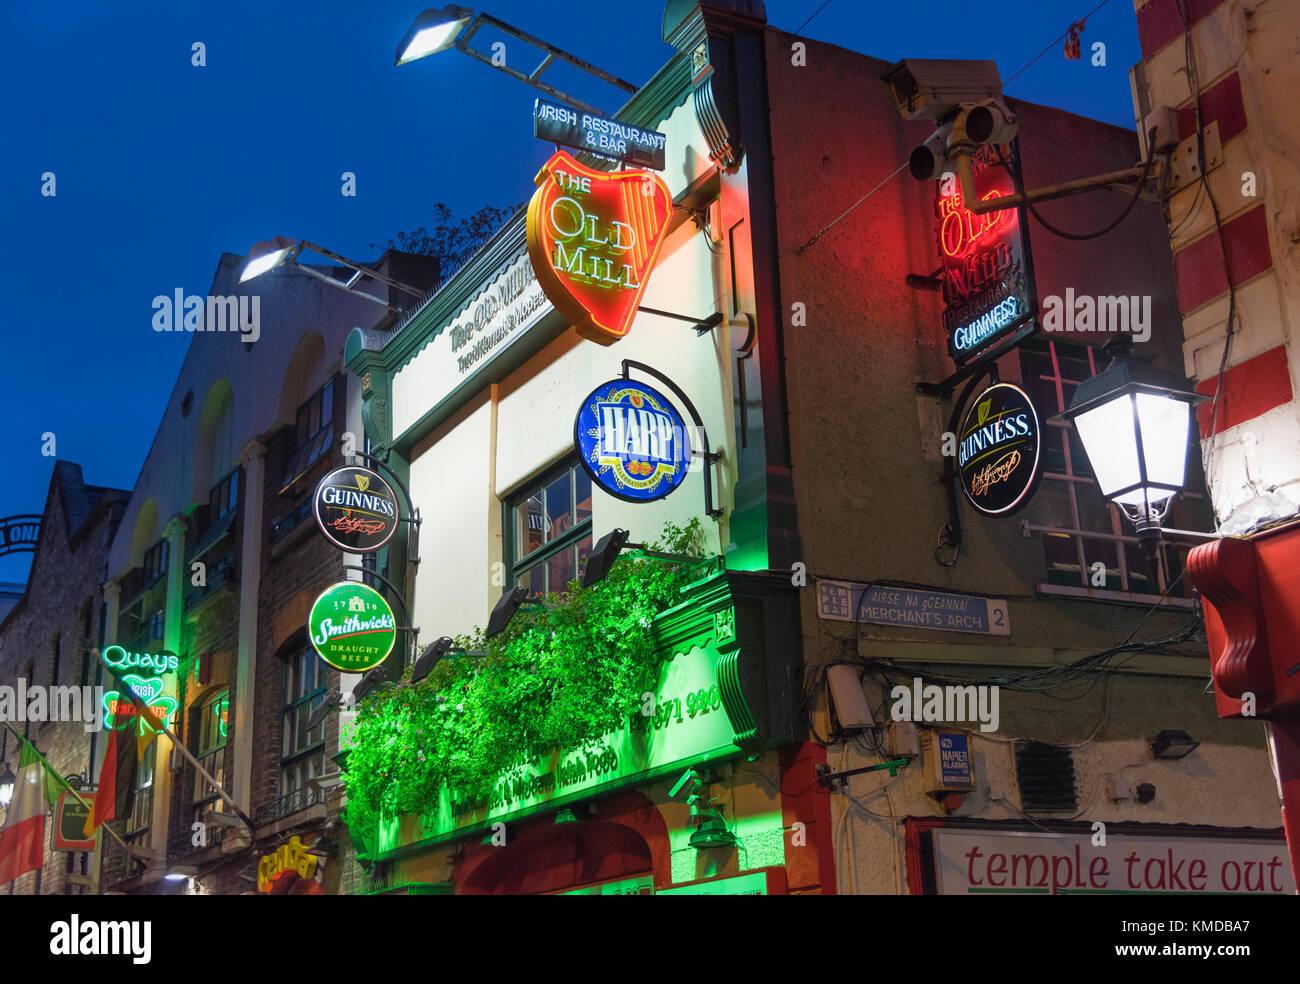 Temple Bar area Pub signs Dublin Ireland - Stock Image